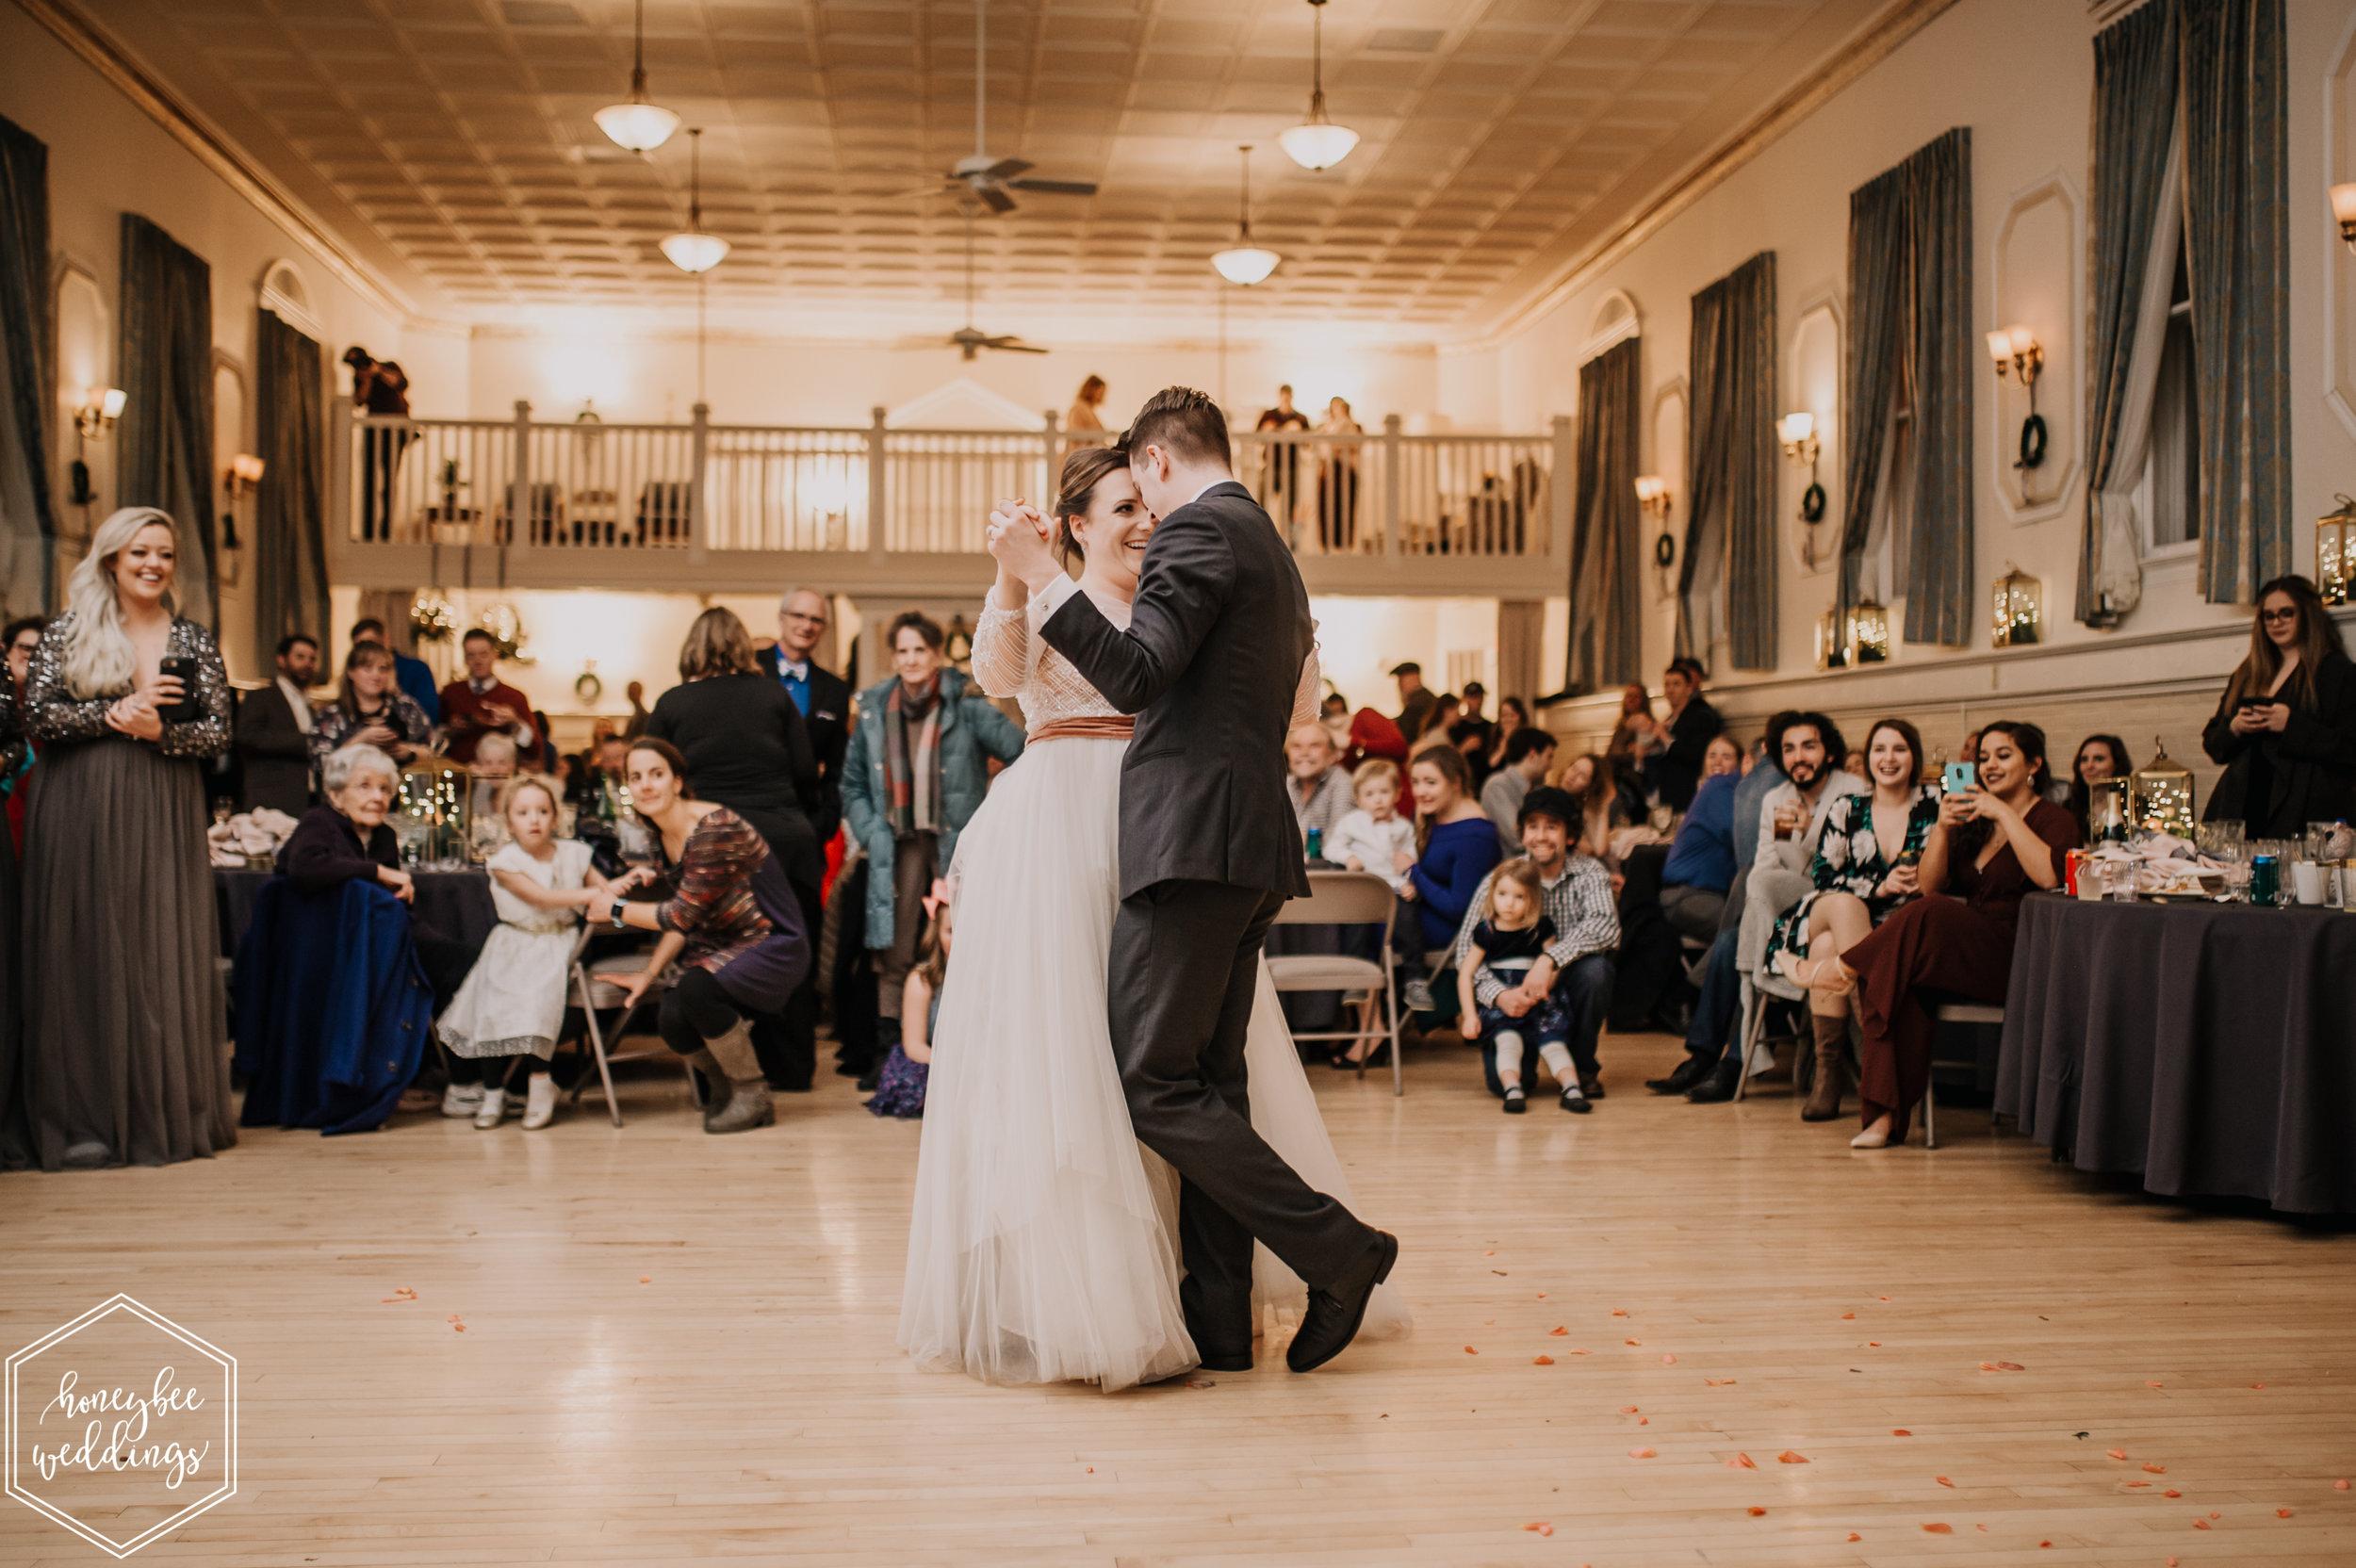 0301Montana Wedding Photographer_Montana winter wedding_Wedding at Fort Missoula_Meri & Carter_January 19, 2018-817.jpg